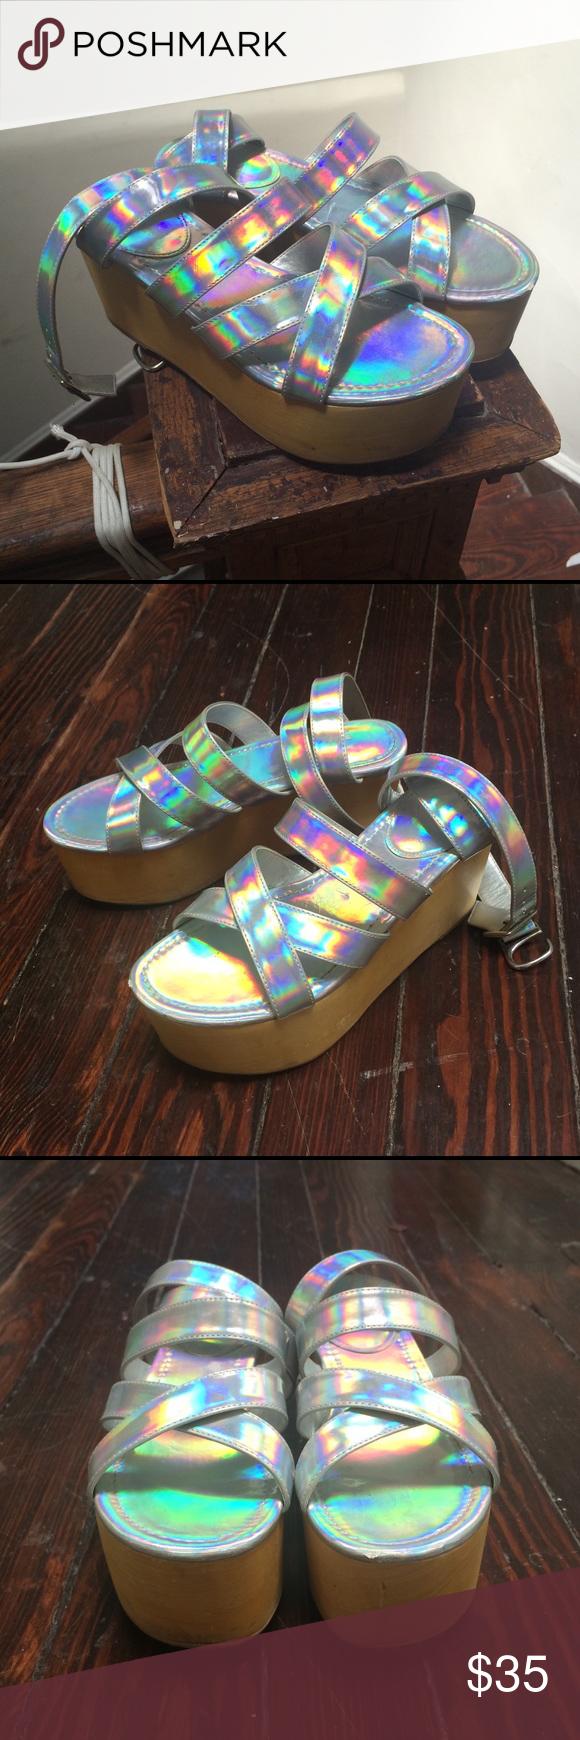 3fc14fa403e9 strappy holographic platform flatform sandals 👽✨✨ holographic strappy  platform sandals purchased in Japan. brand  ulula. size small